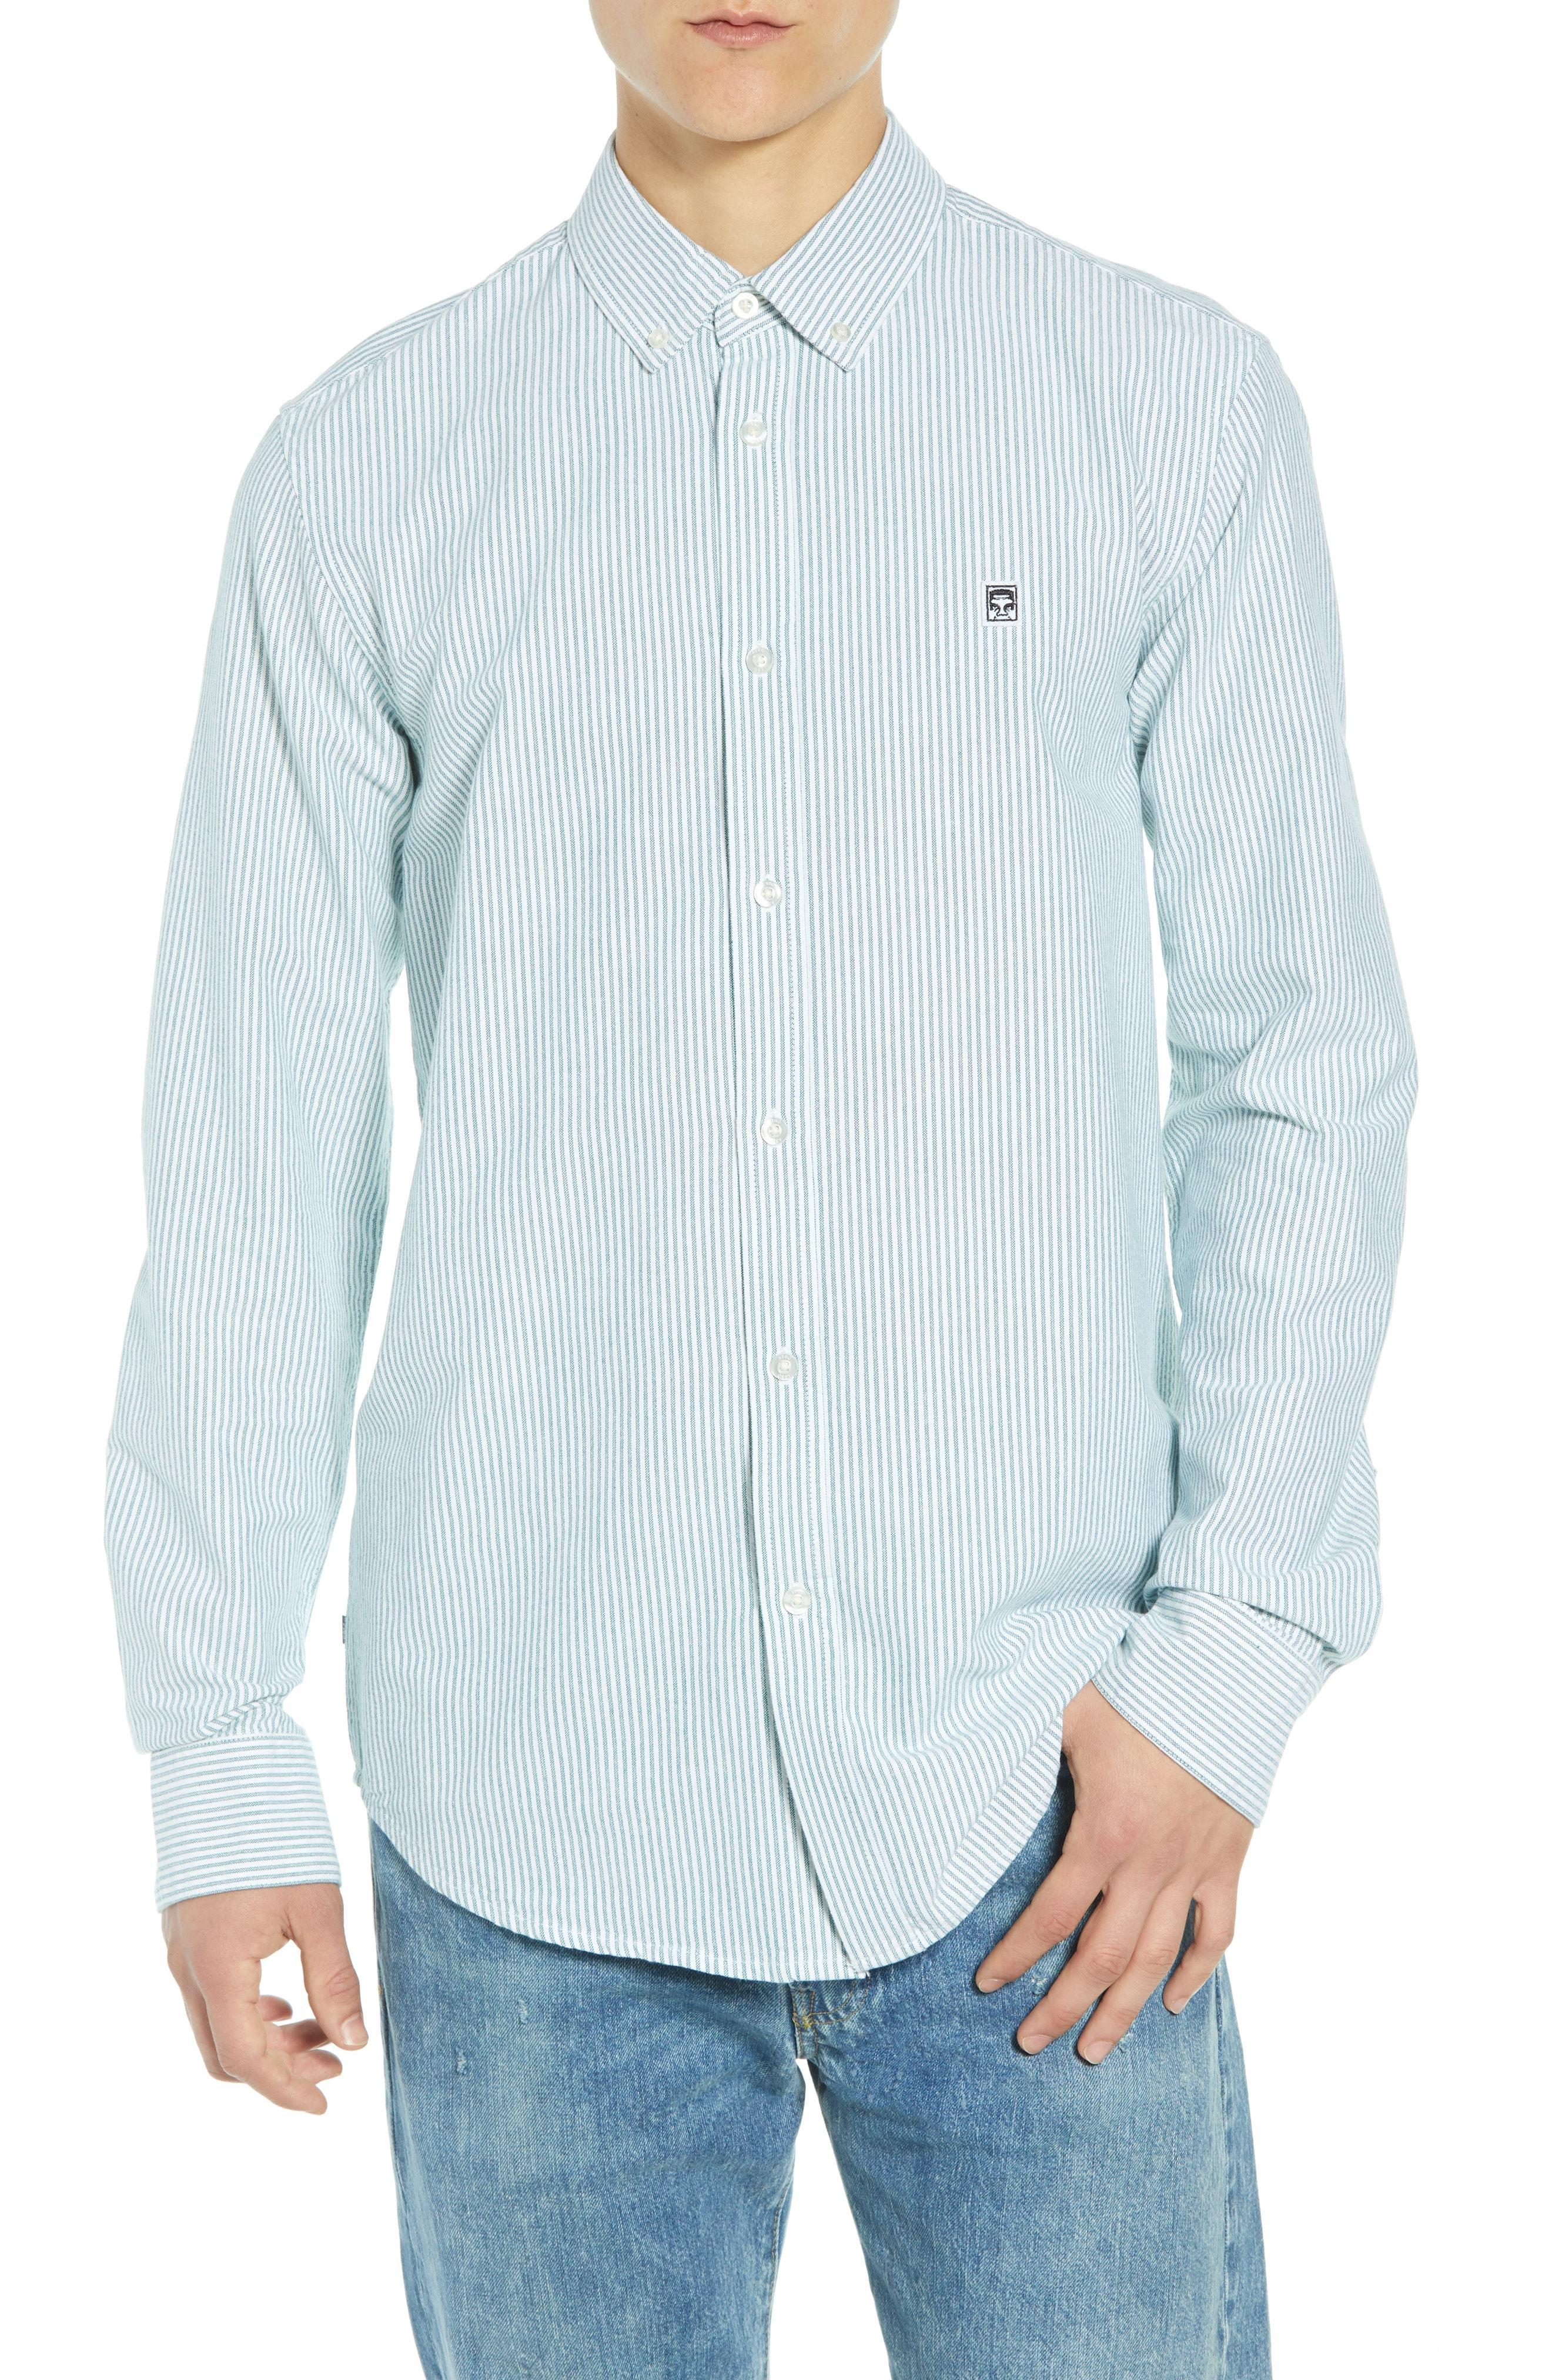 Obey Eighty Nine Pinstripe Sport Shirt